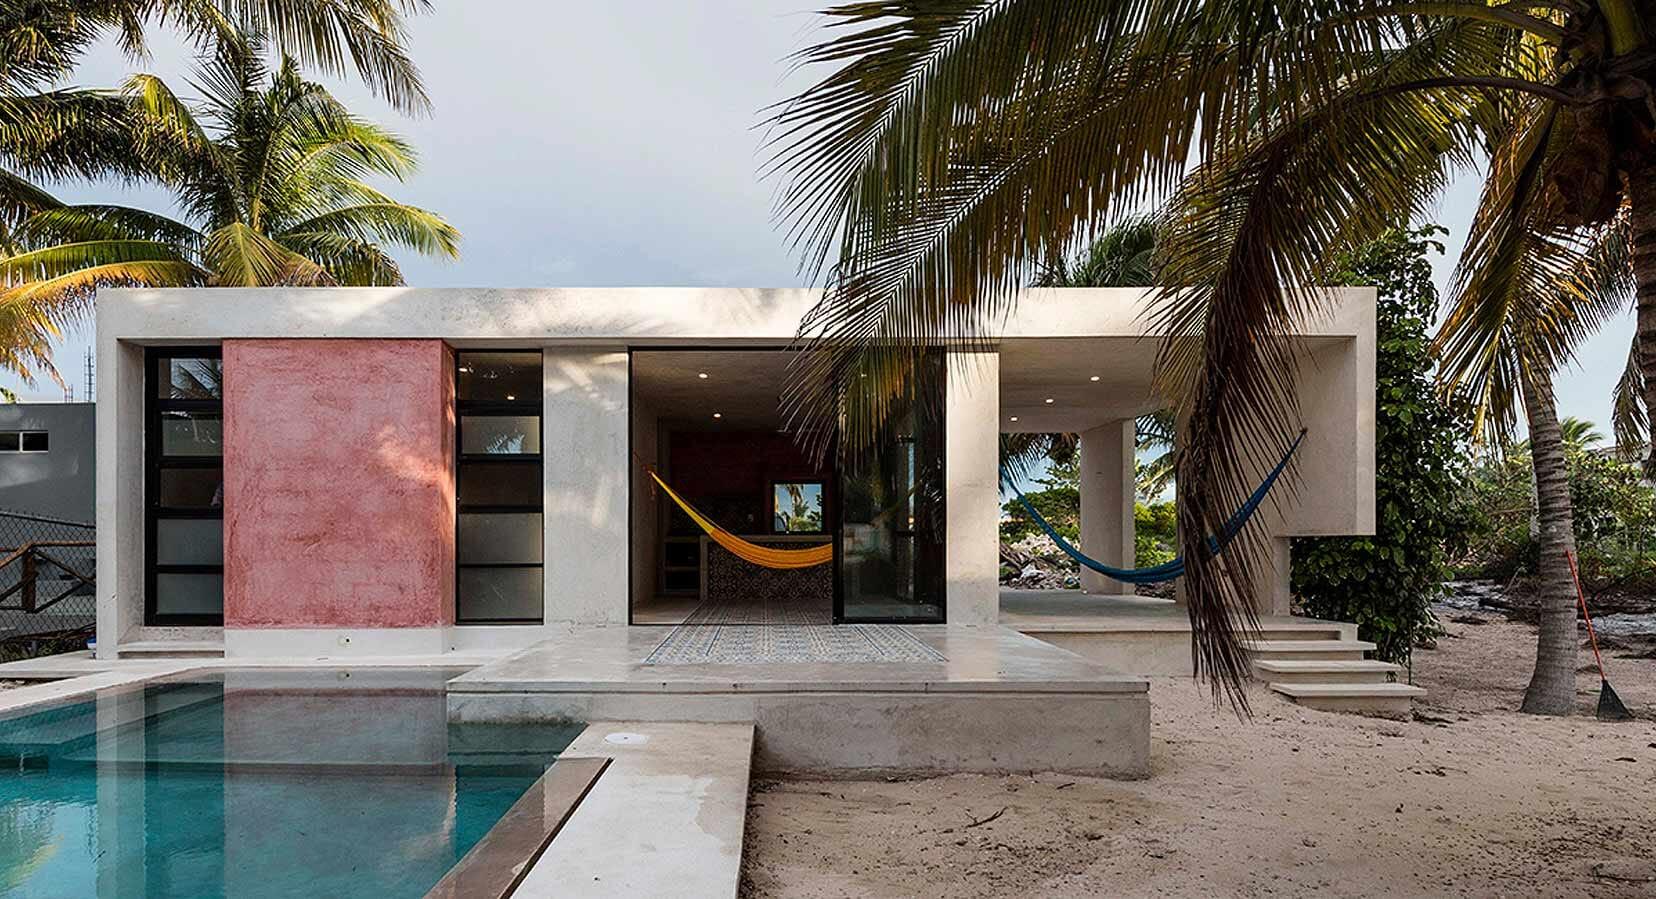 Escape To The El Palmar Summer House In Mexico